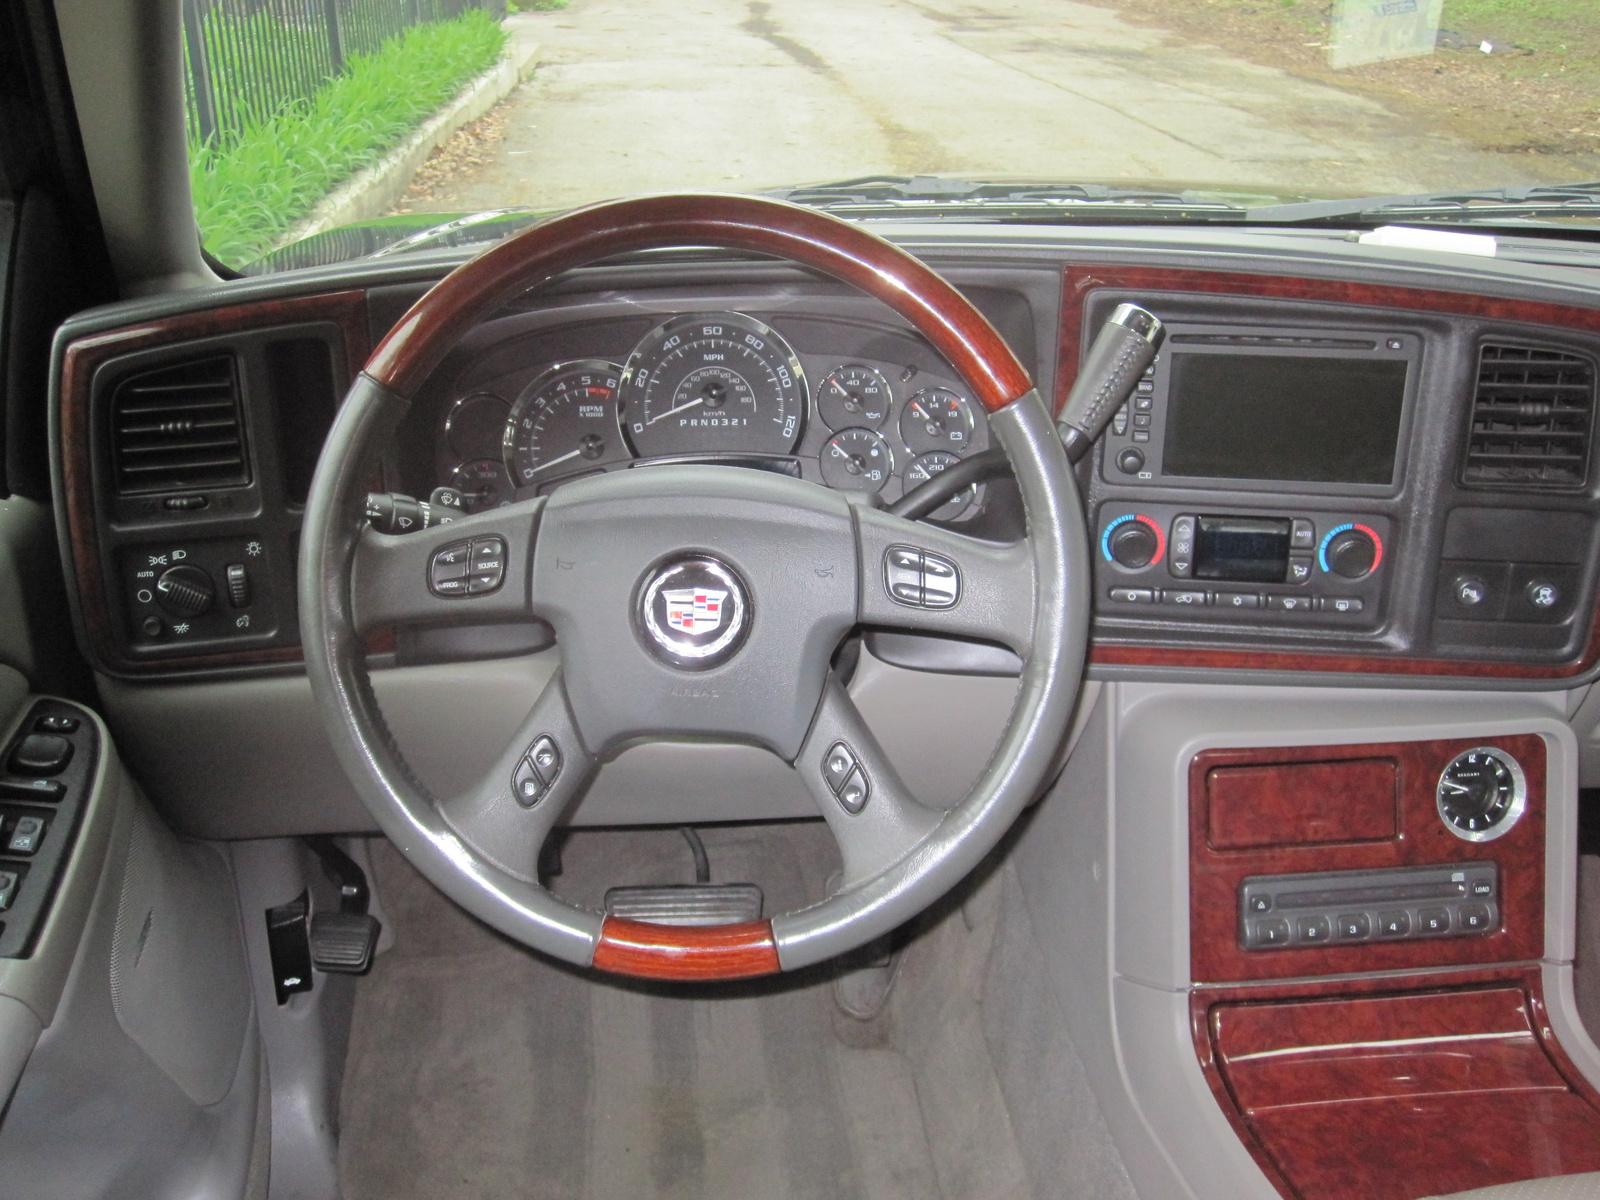 2006 Cadillac Escalade Ext Pictures Cargurus